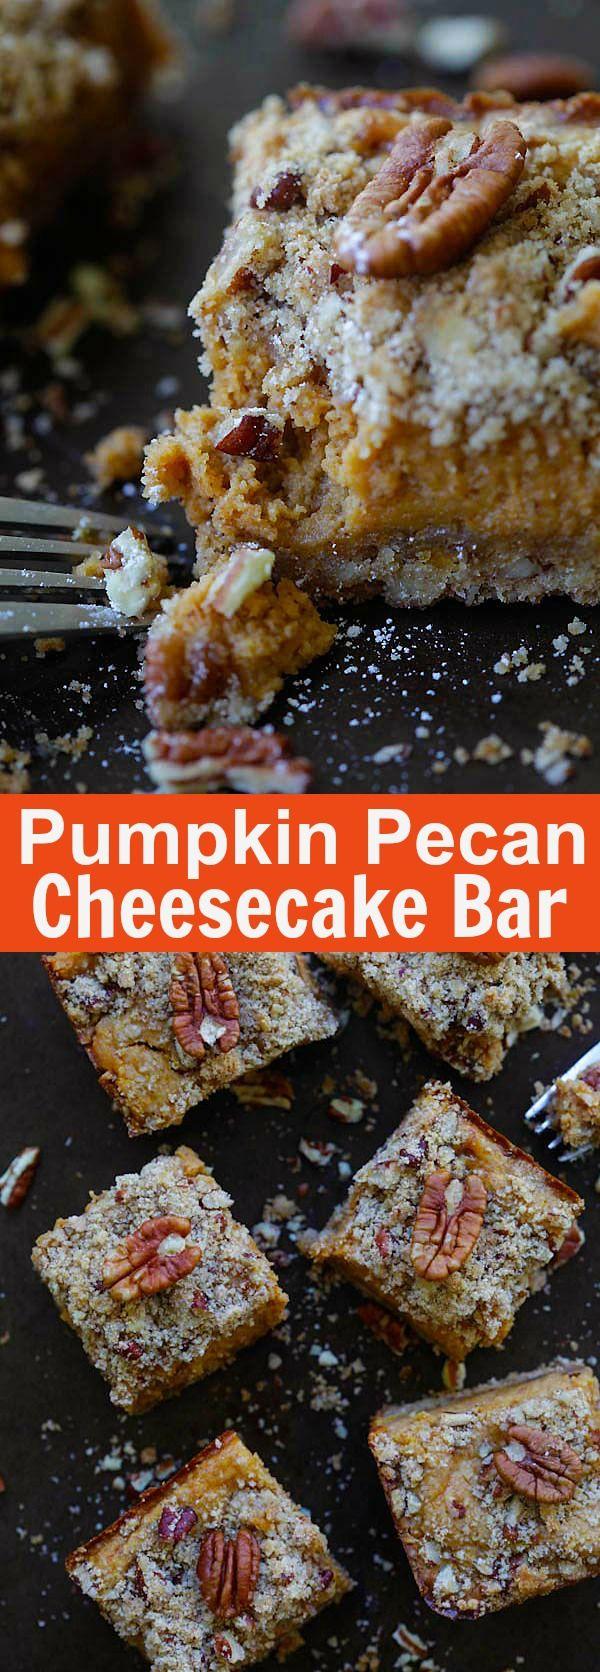 Pumpkin Pecan Cheesecake Bar – best cheesecake bar recipe ever with pumpkin and pecan. Creamy, sweet and perfect for holidays | rasamalaysia.com